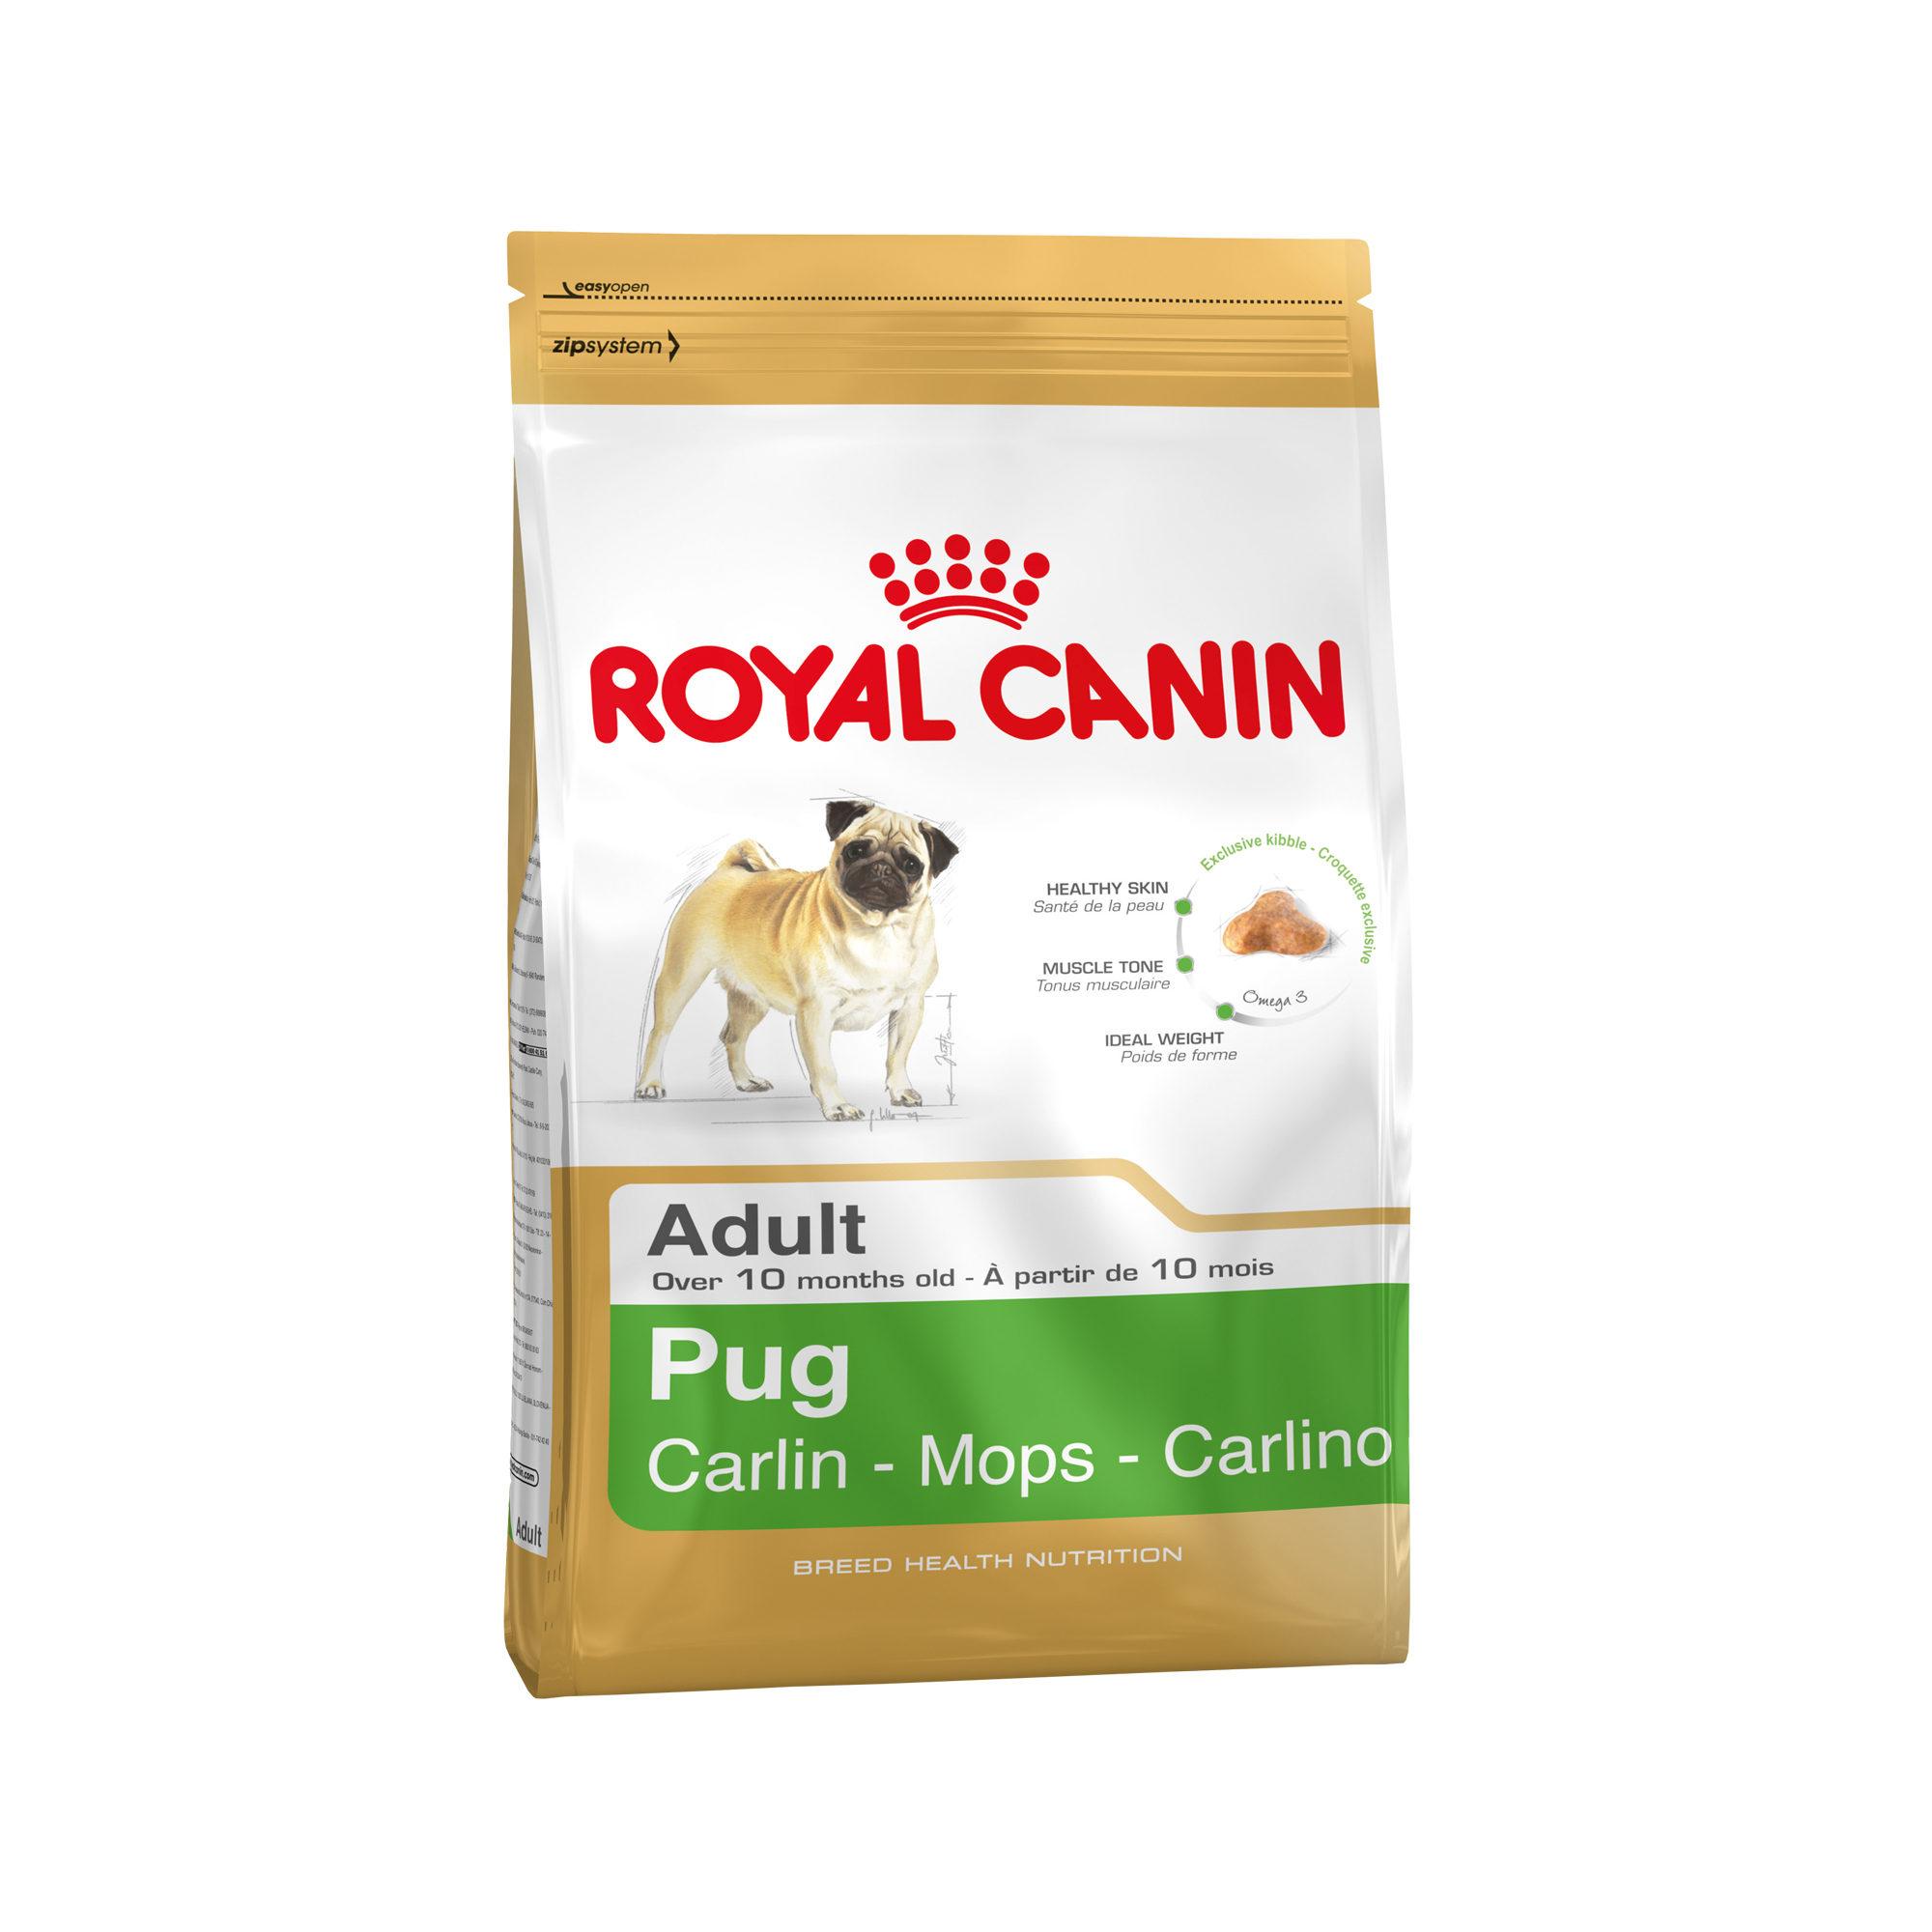 Royal Canin Pug (Mops) Adult